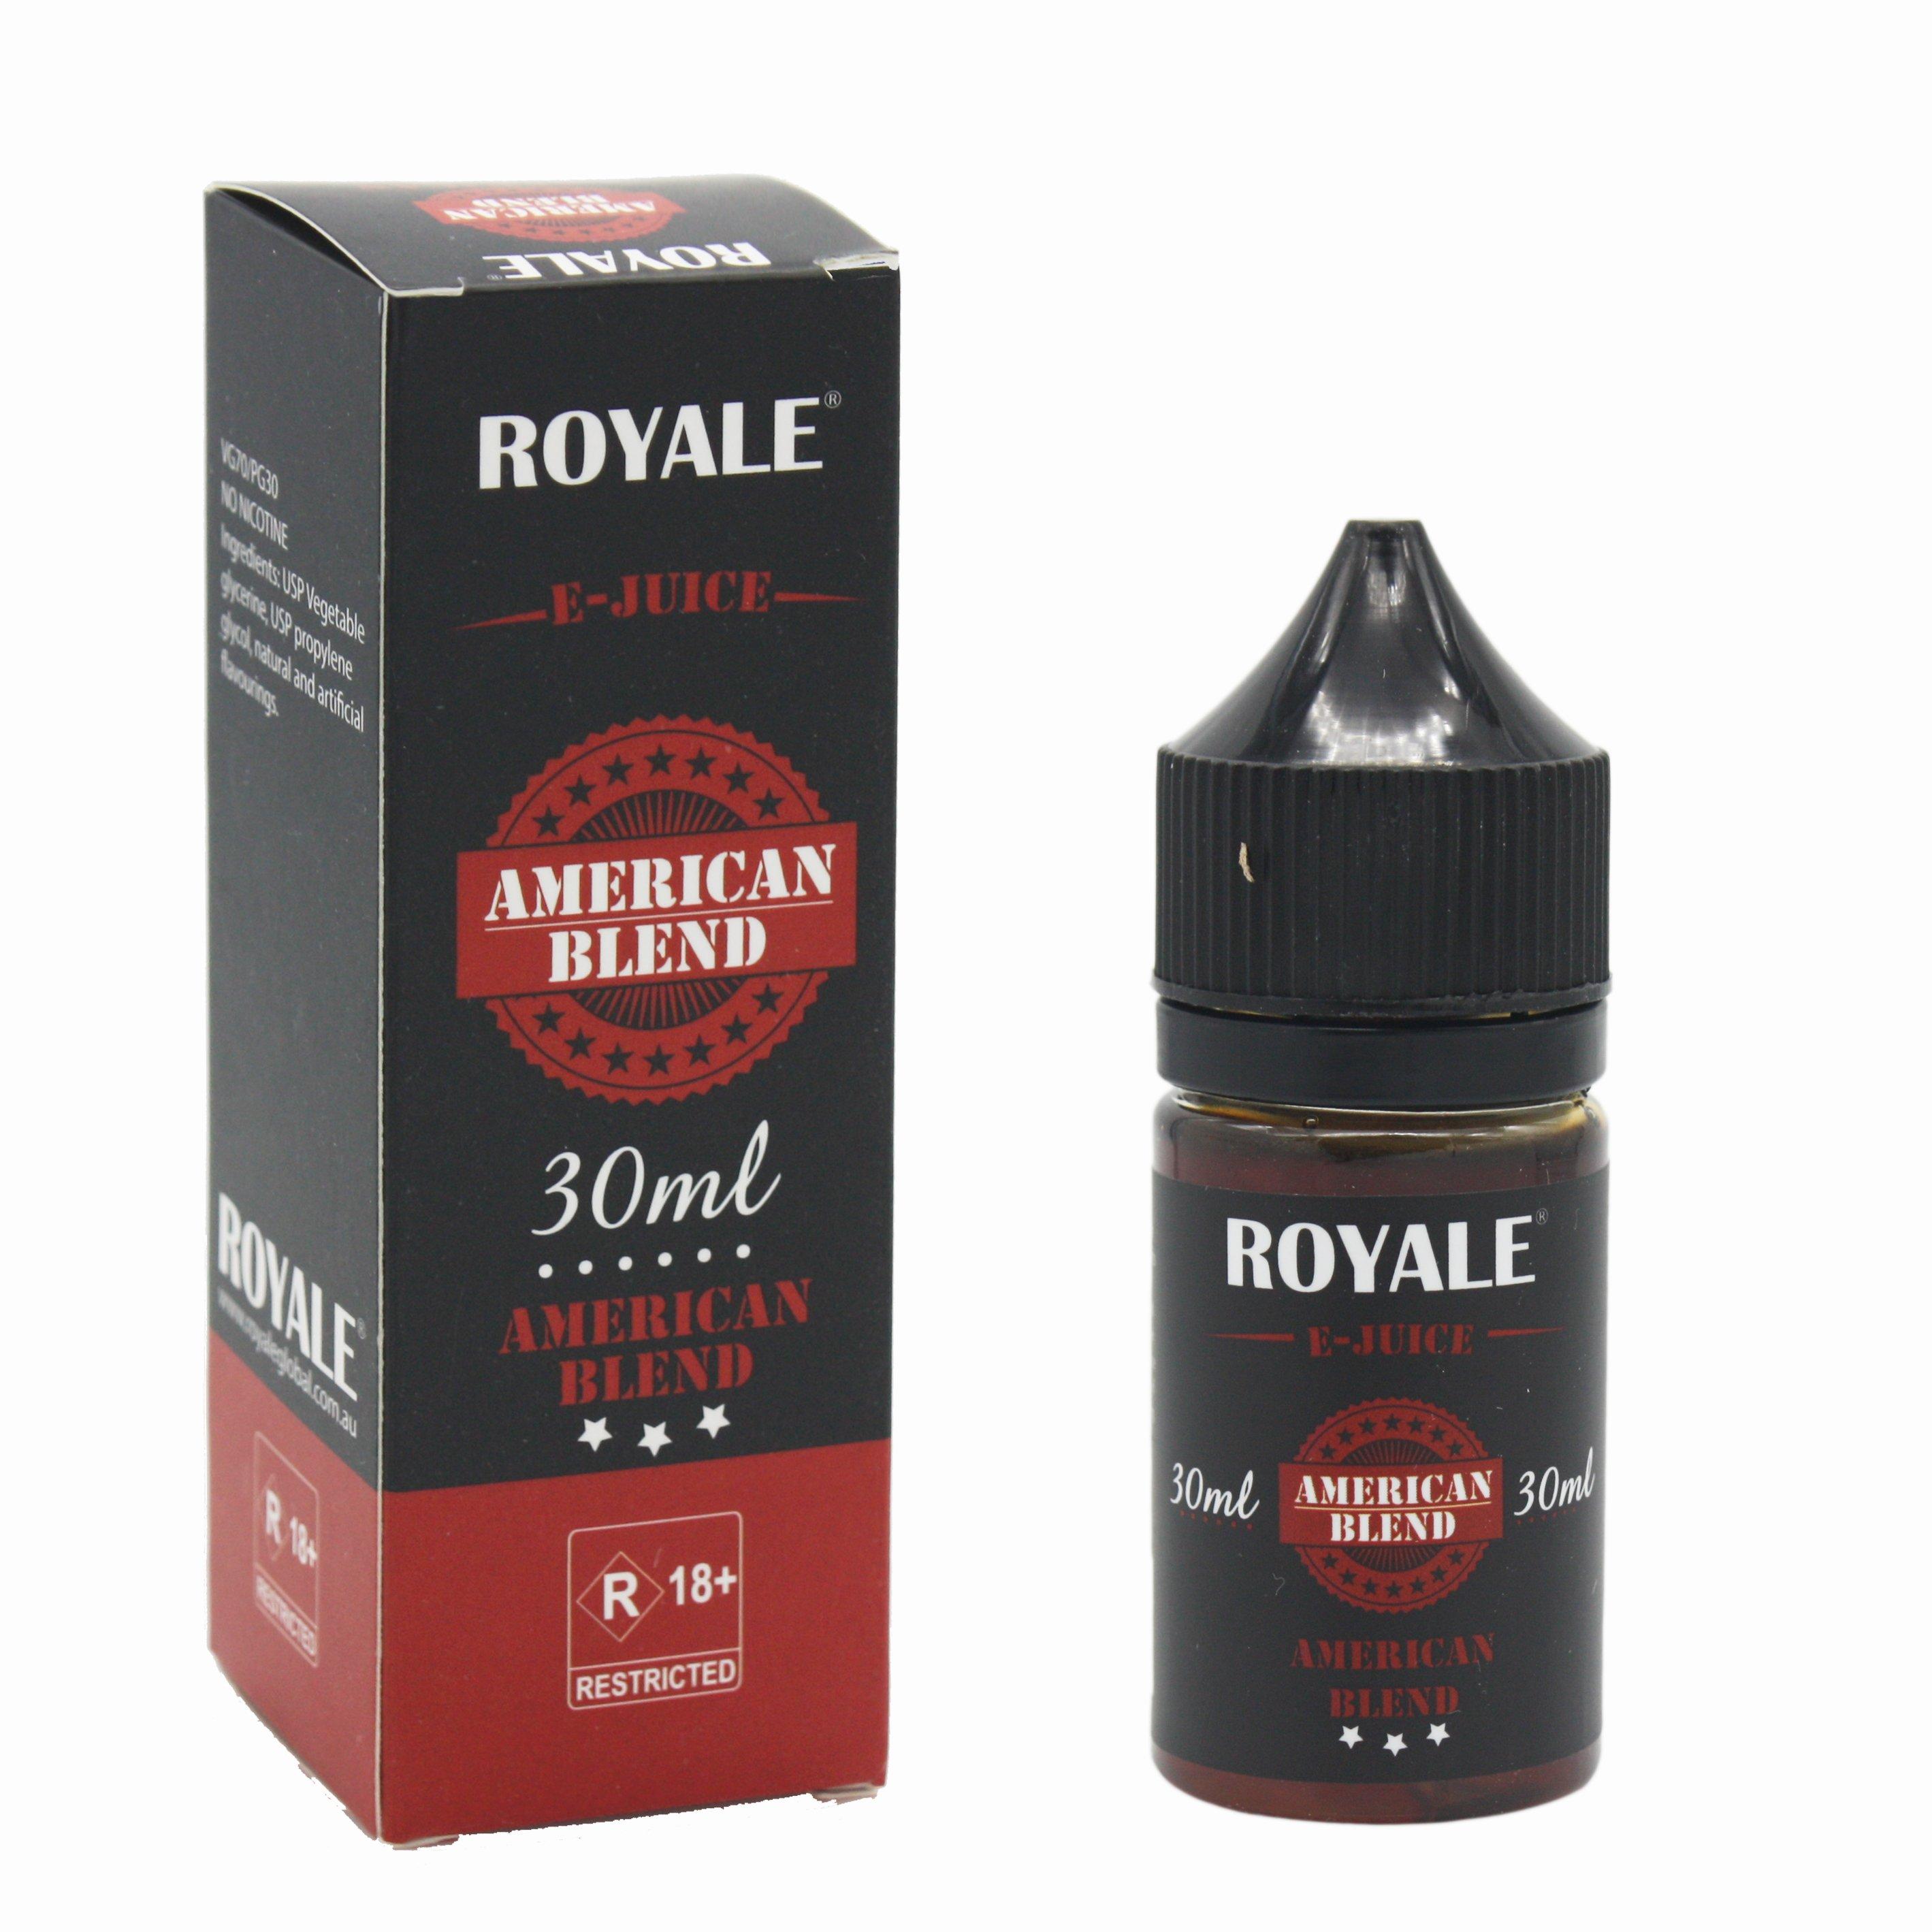 Royale E-juice American Blend 30ml